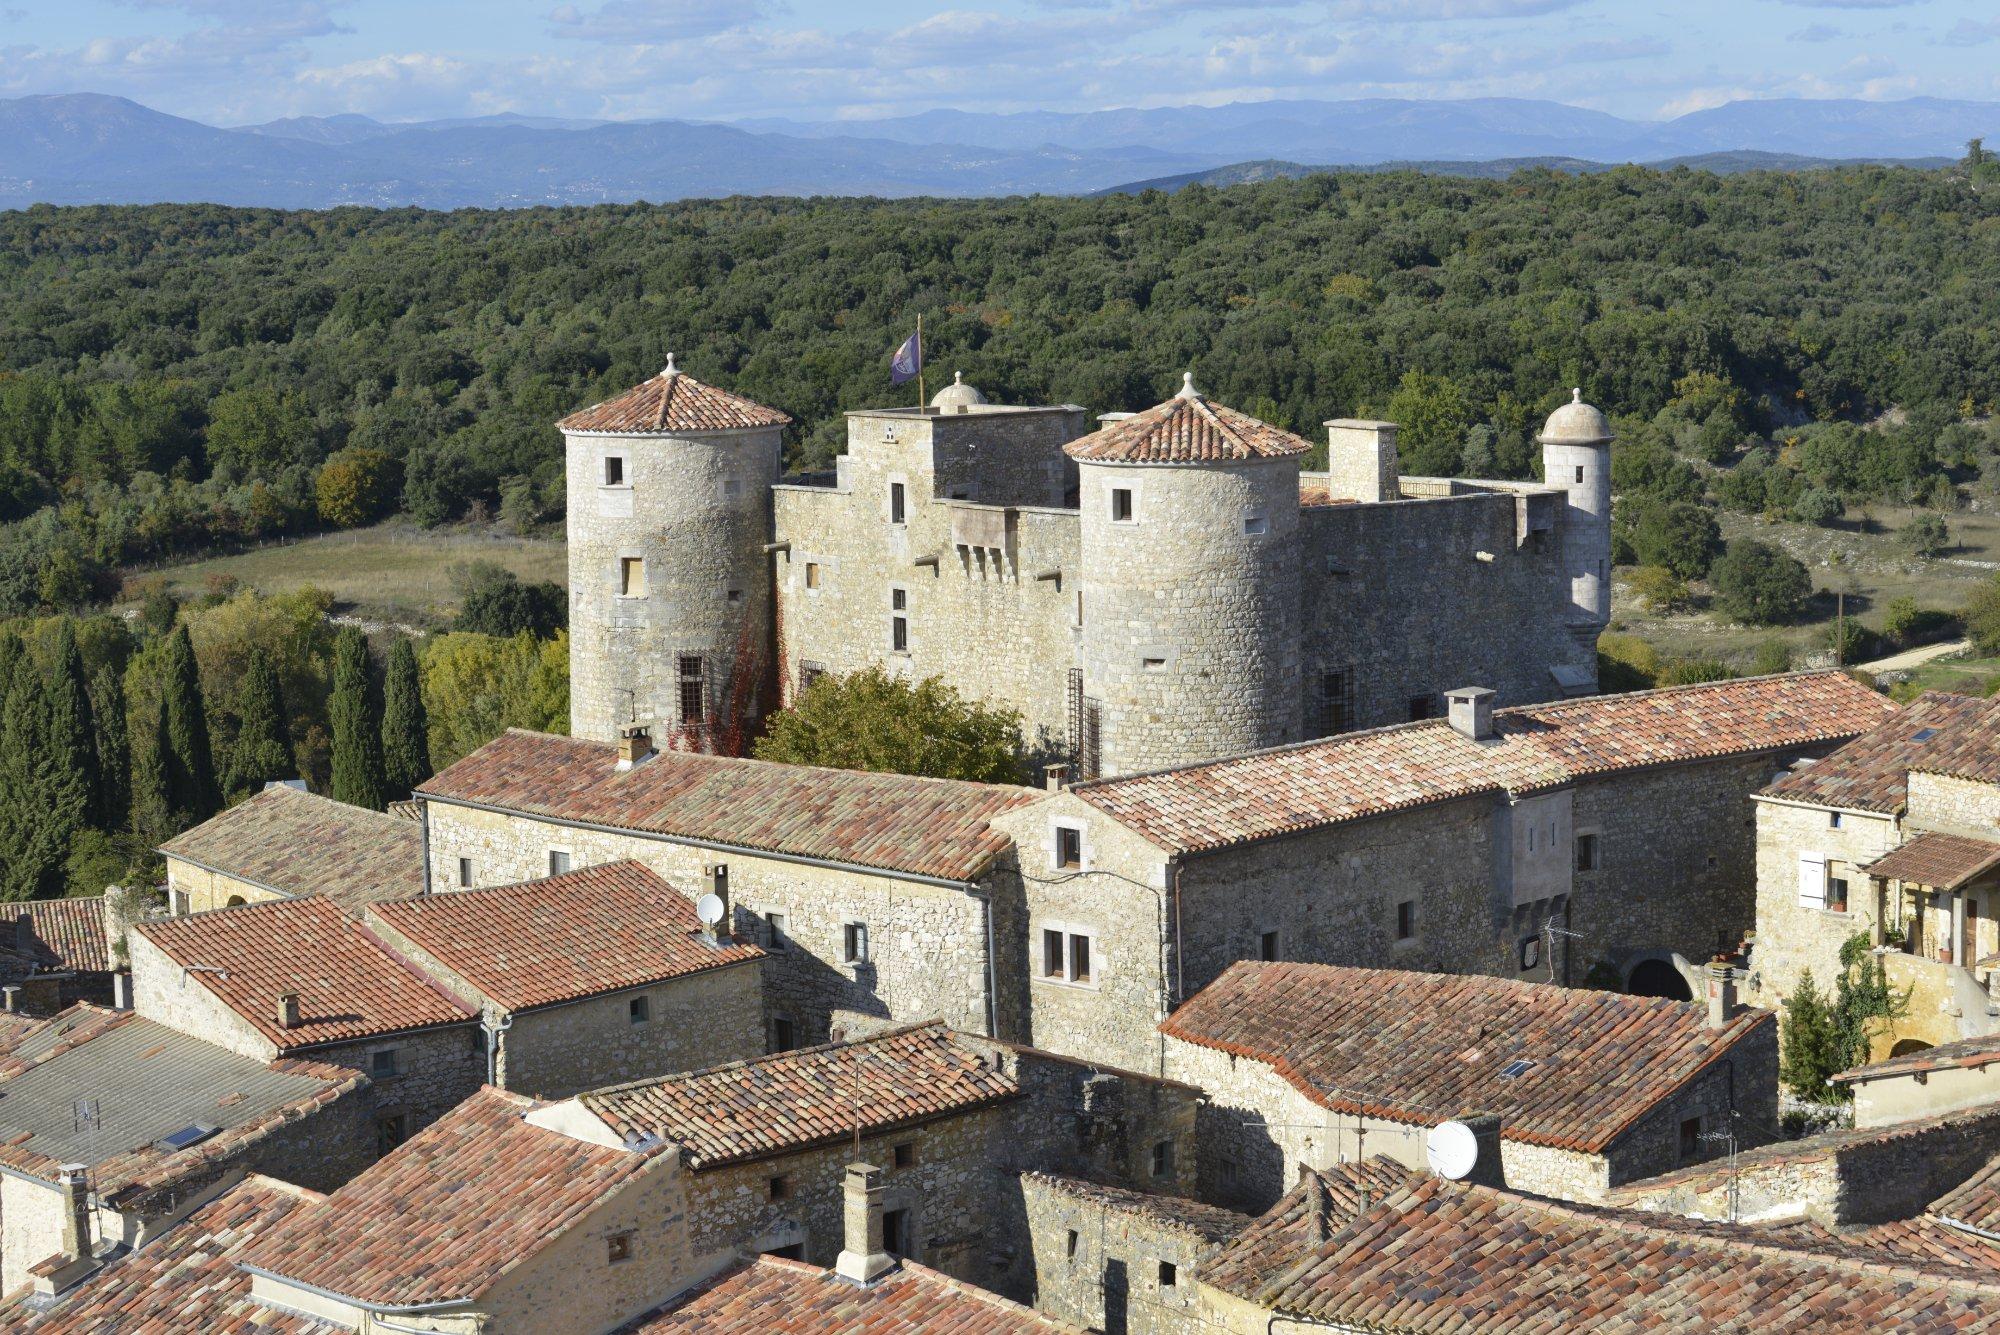 1216-chateau-des-roure-ardeche.jpg